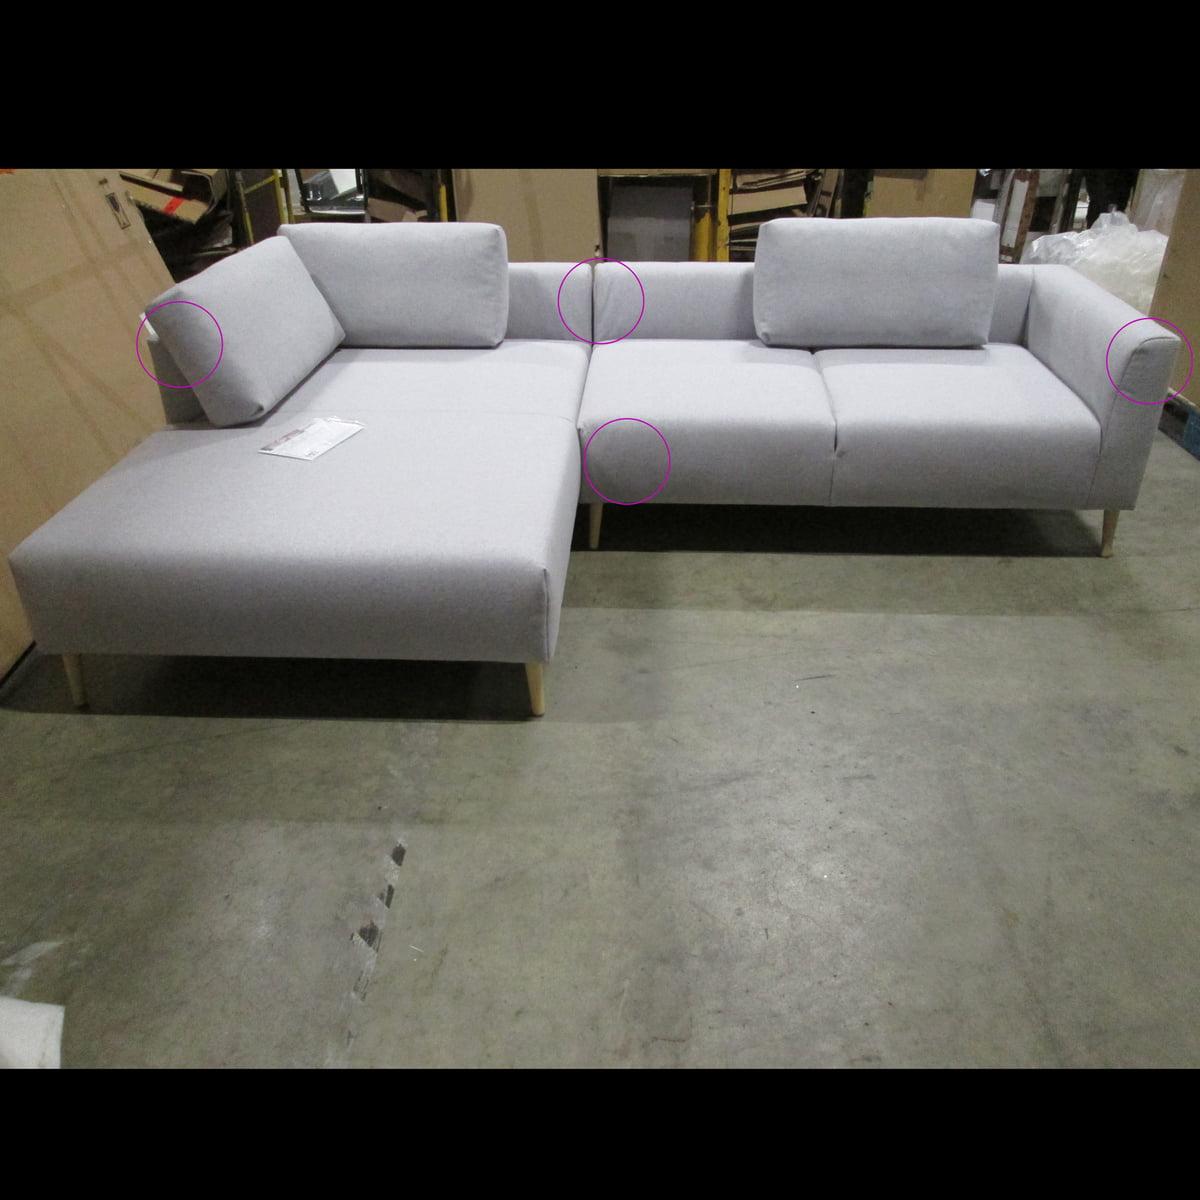 Design Sale - freistil - 162 Sofaecke Récamiere links